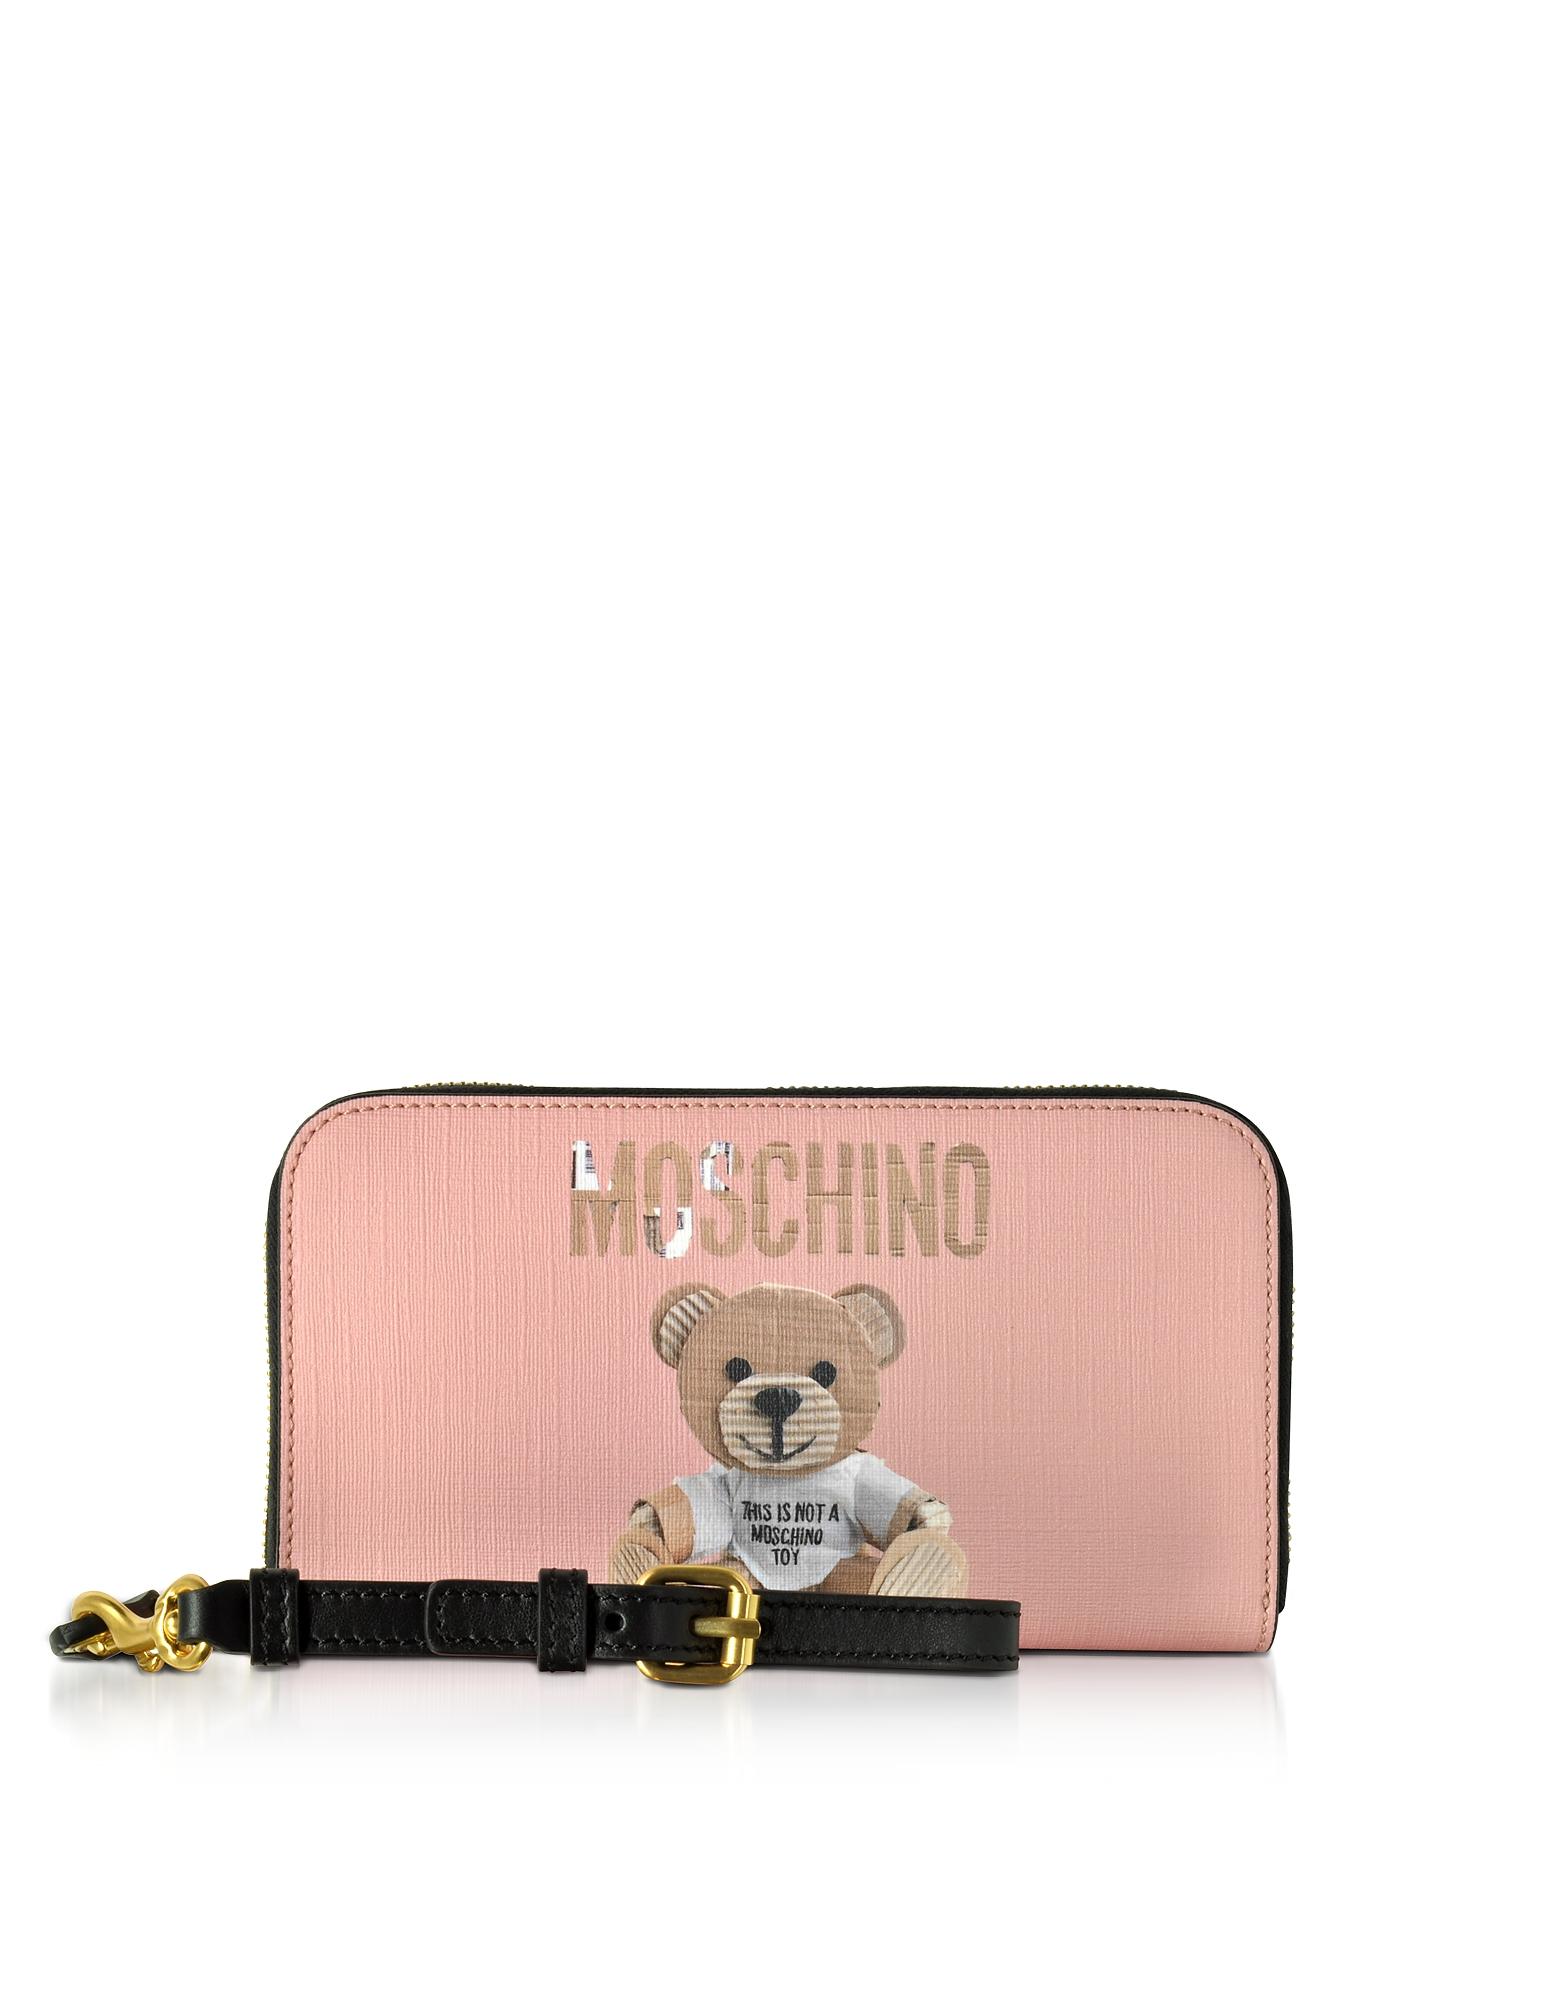 Moschino Handbags, Teddy Bear Saffiano Leather Wallet w/Detachable Wristlet